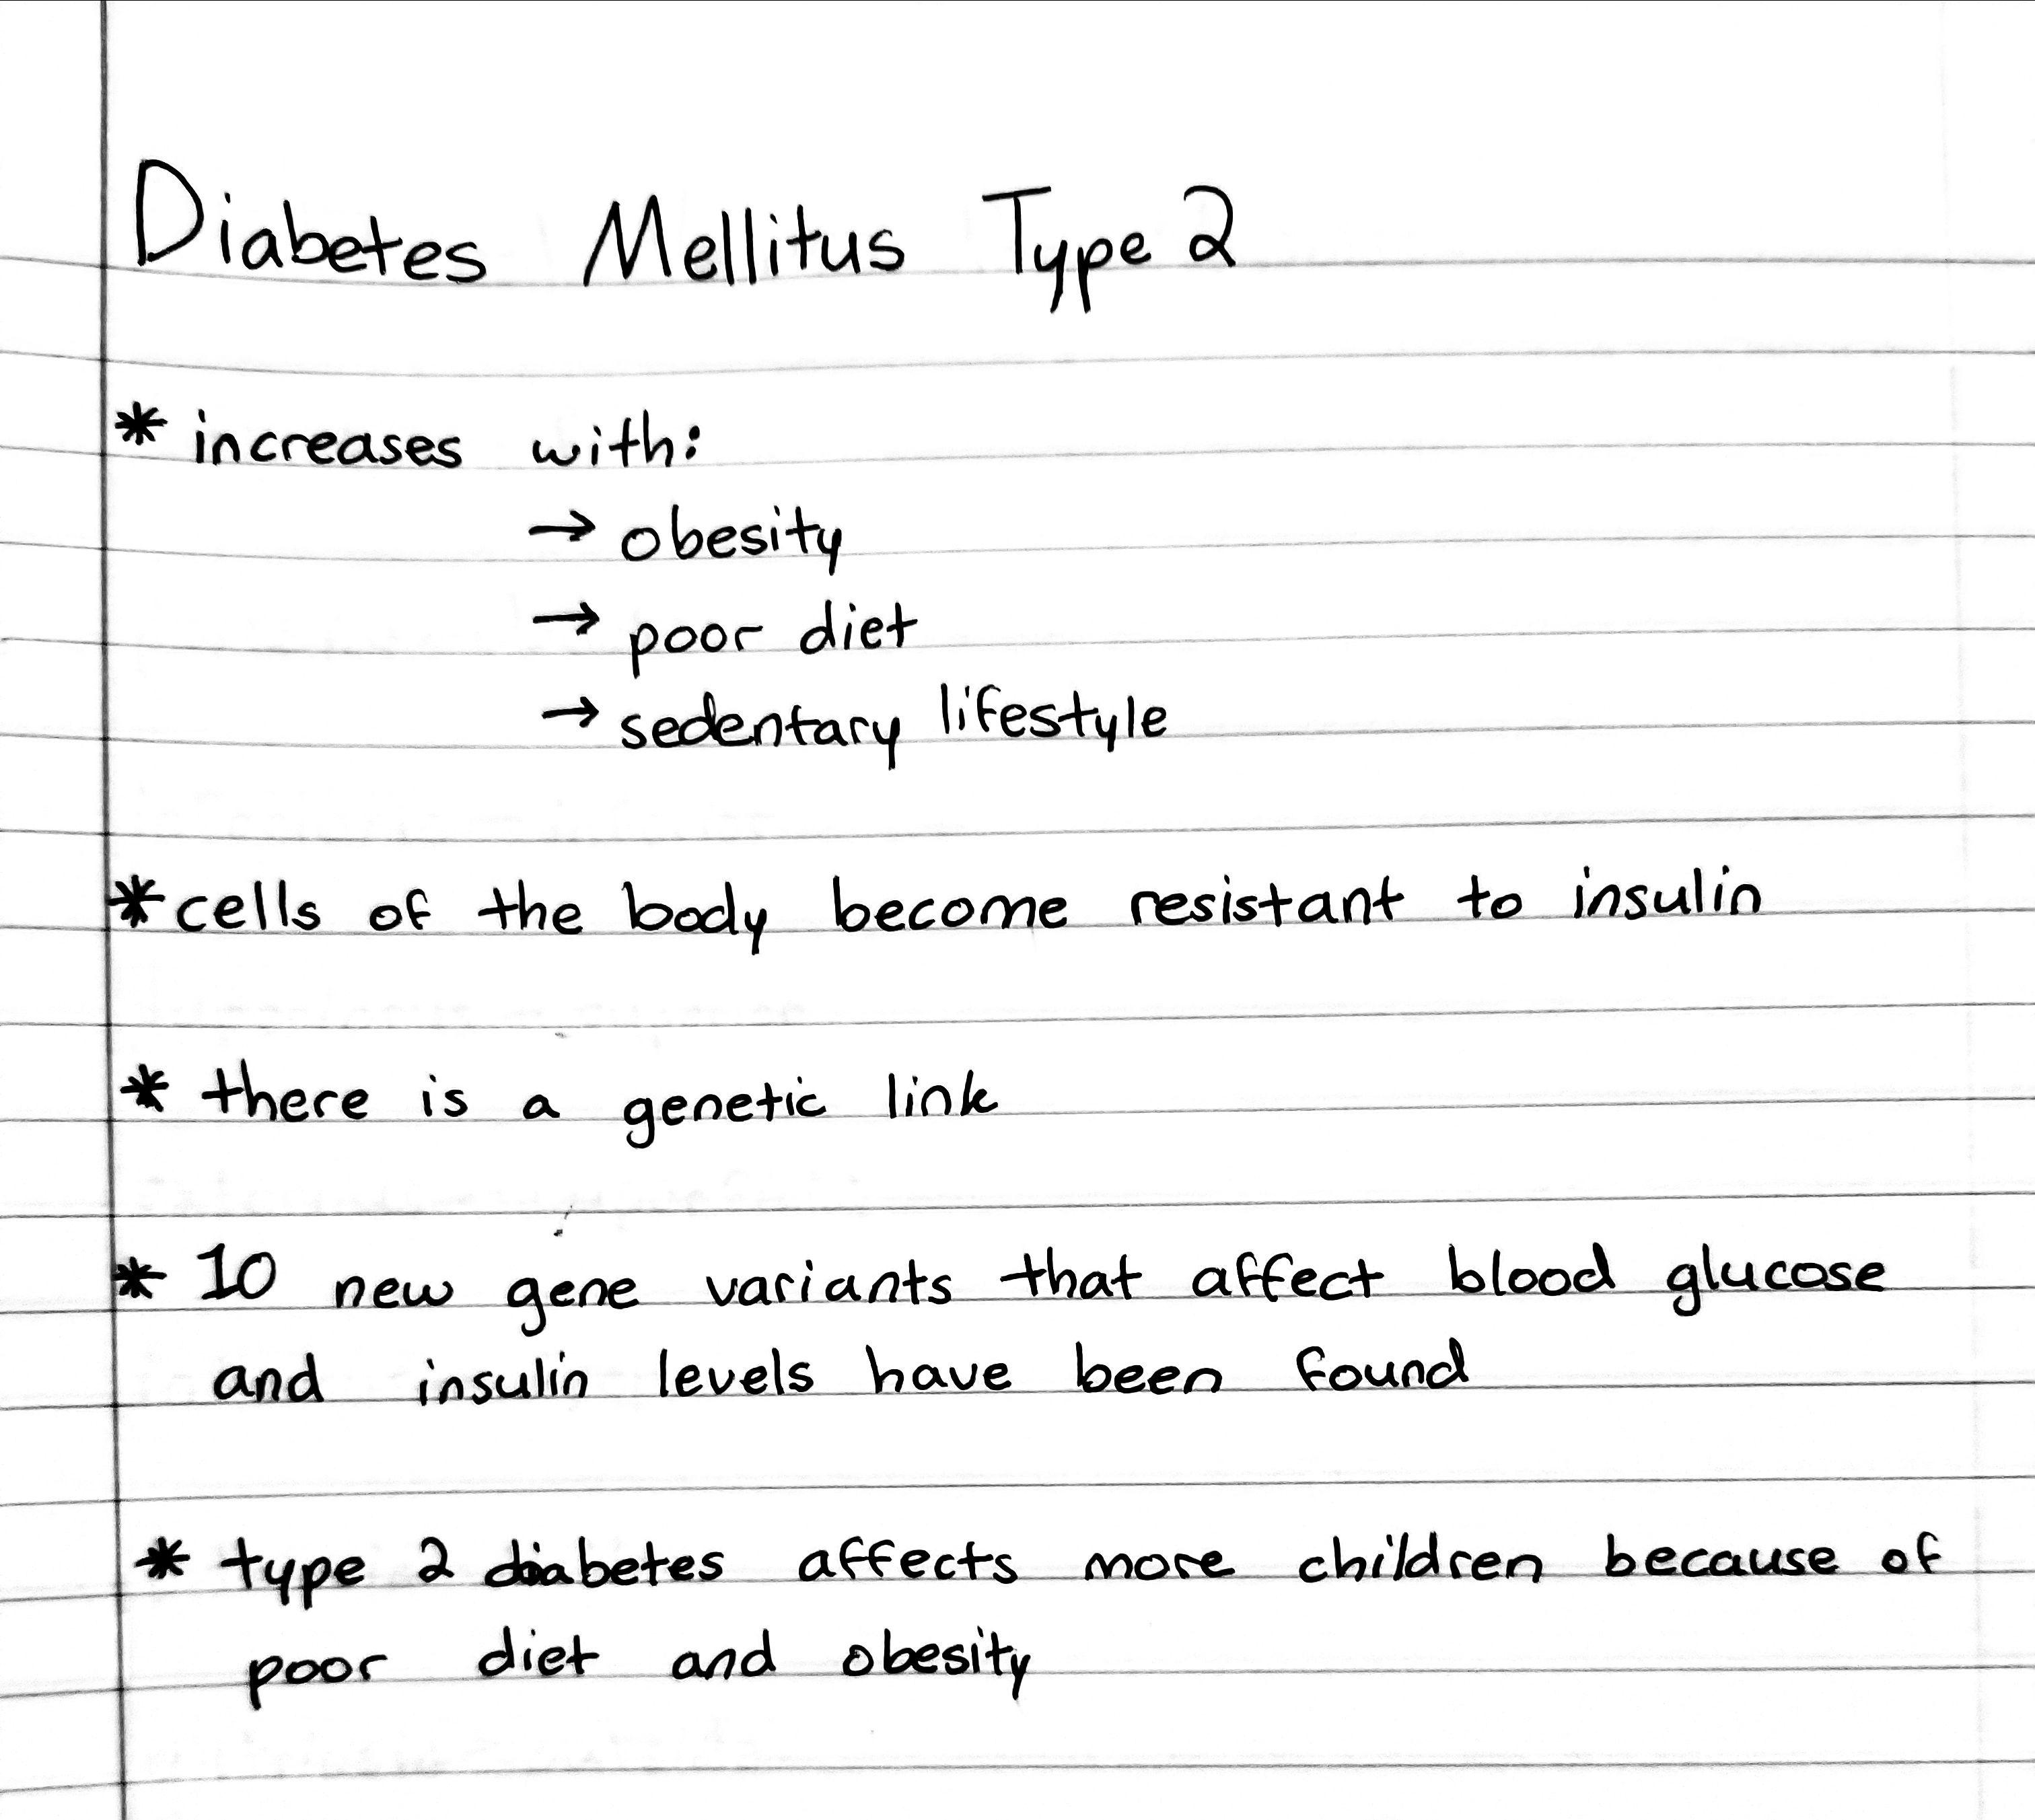 cura pela natureza diabetes mellitus